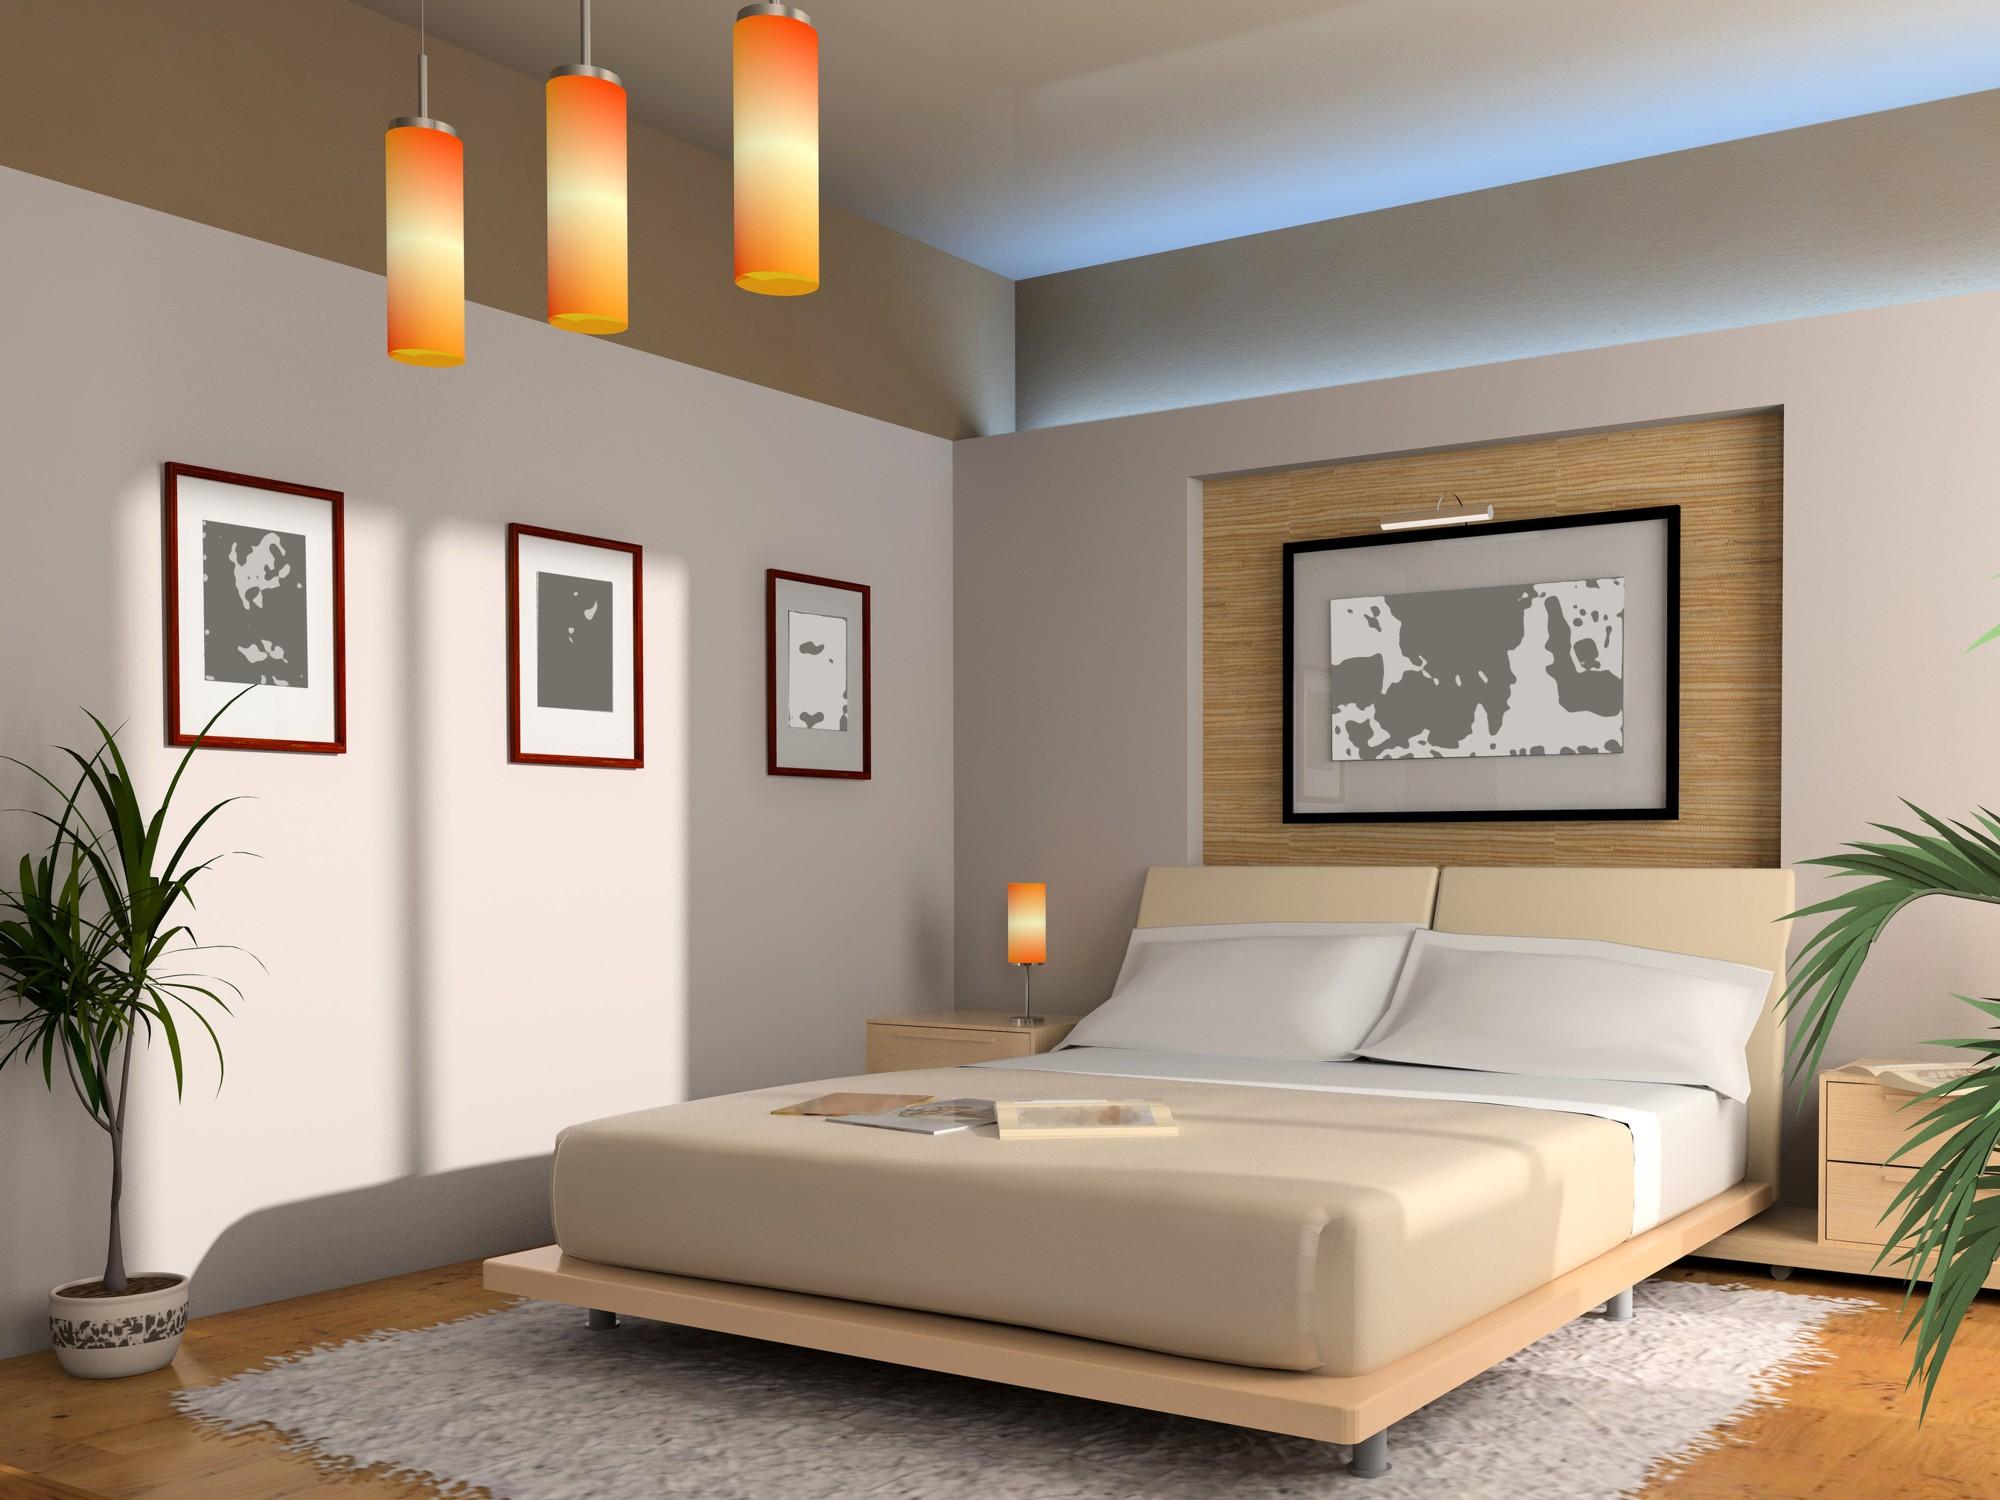 фото цветов в спальне по фен шуй